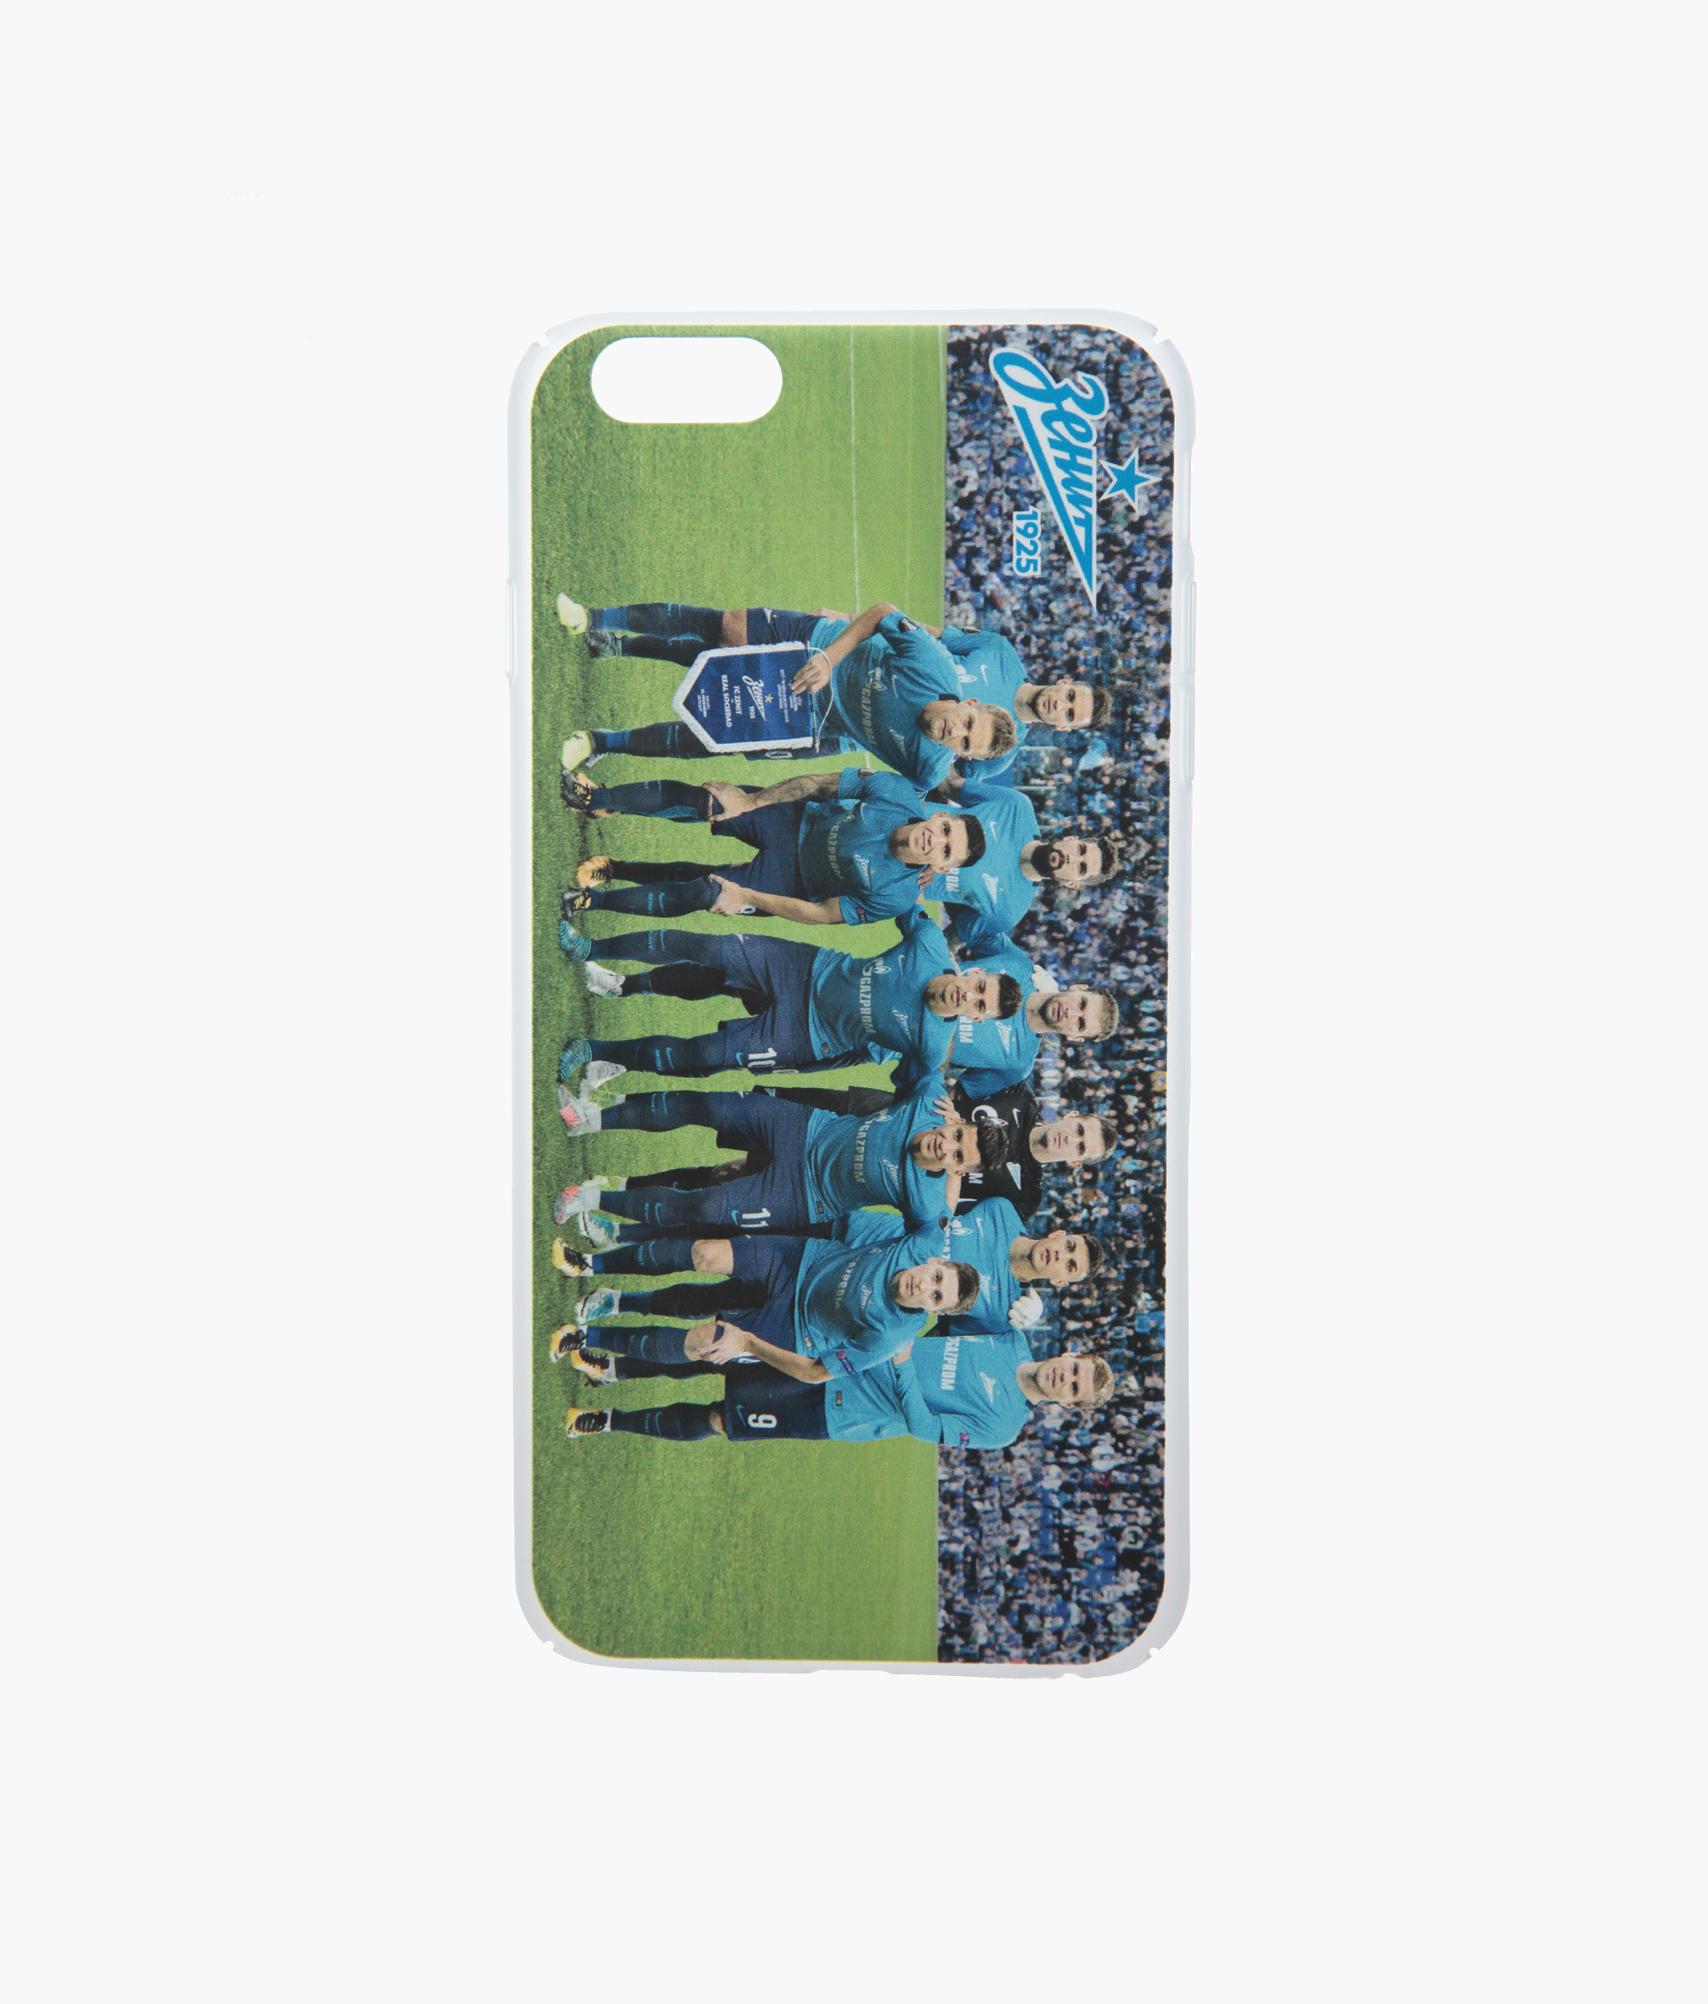 Фото - Чехол для IPhone 6/6S Plus «Команда 2017» Зенит чехол накладка для apple iphone 6 6s deppa gel plus case 85213 pink клип кейс полиуретан